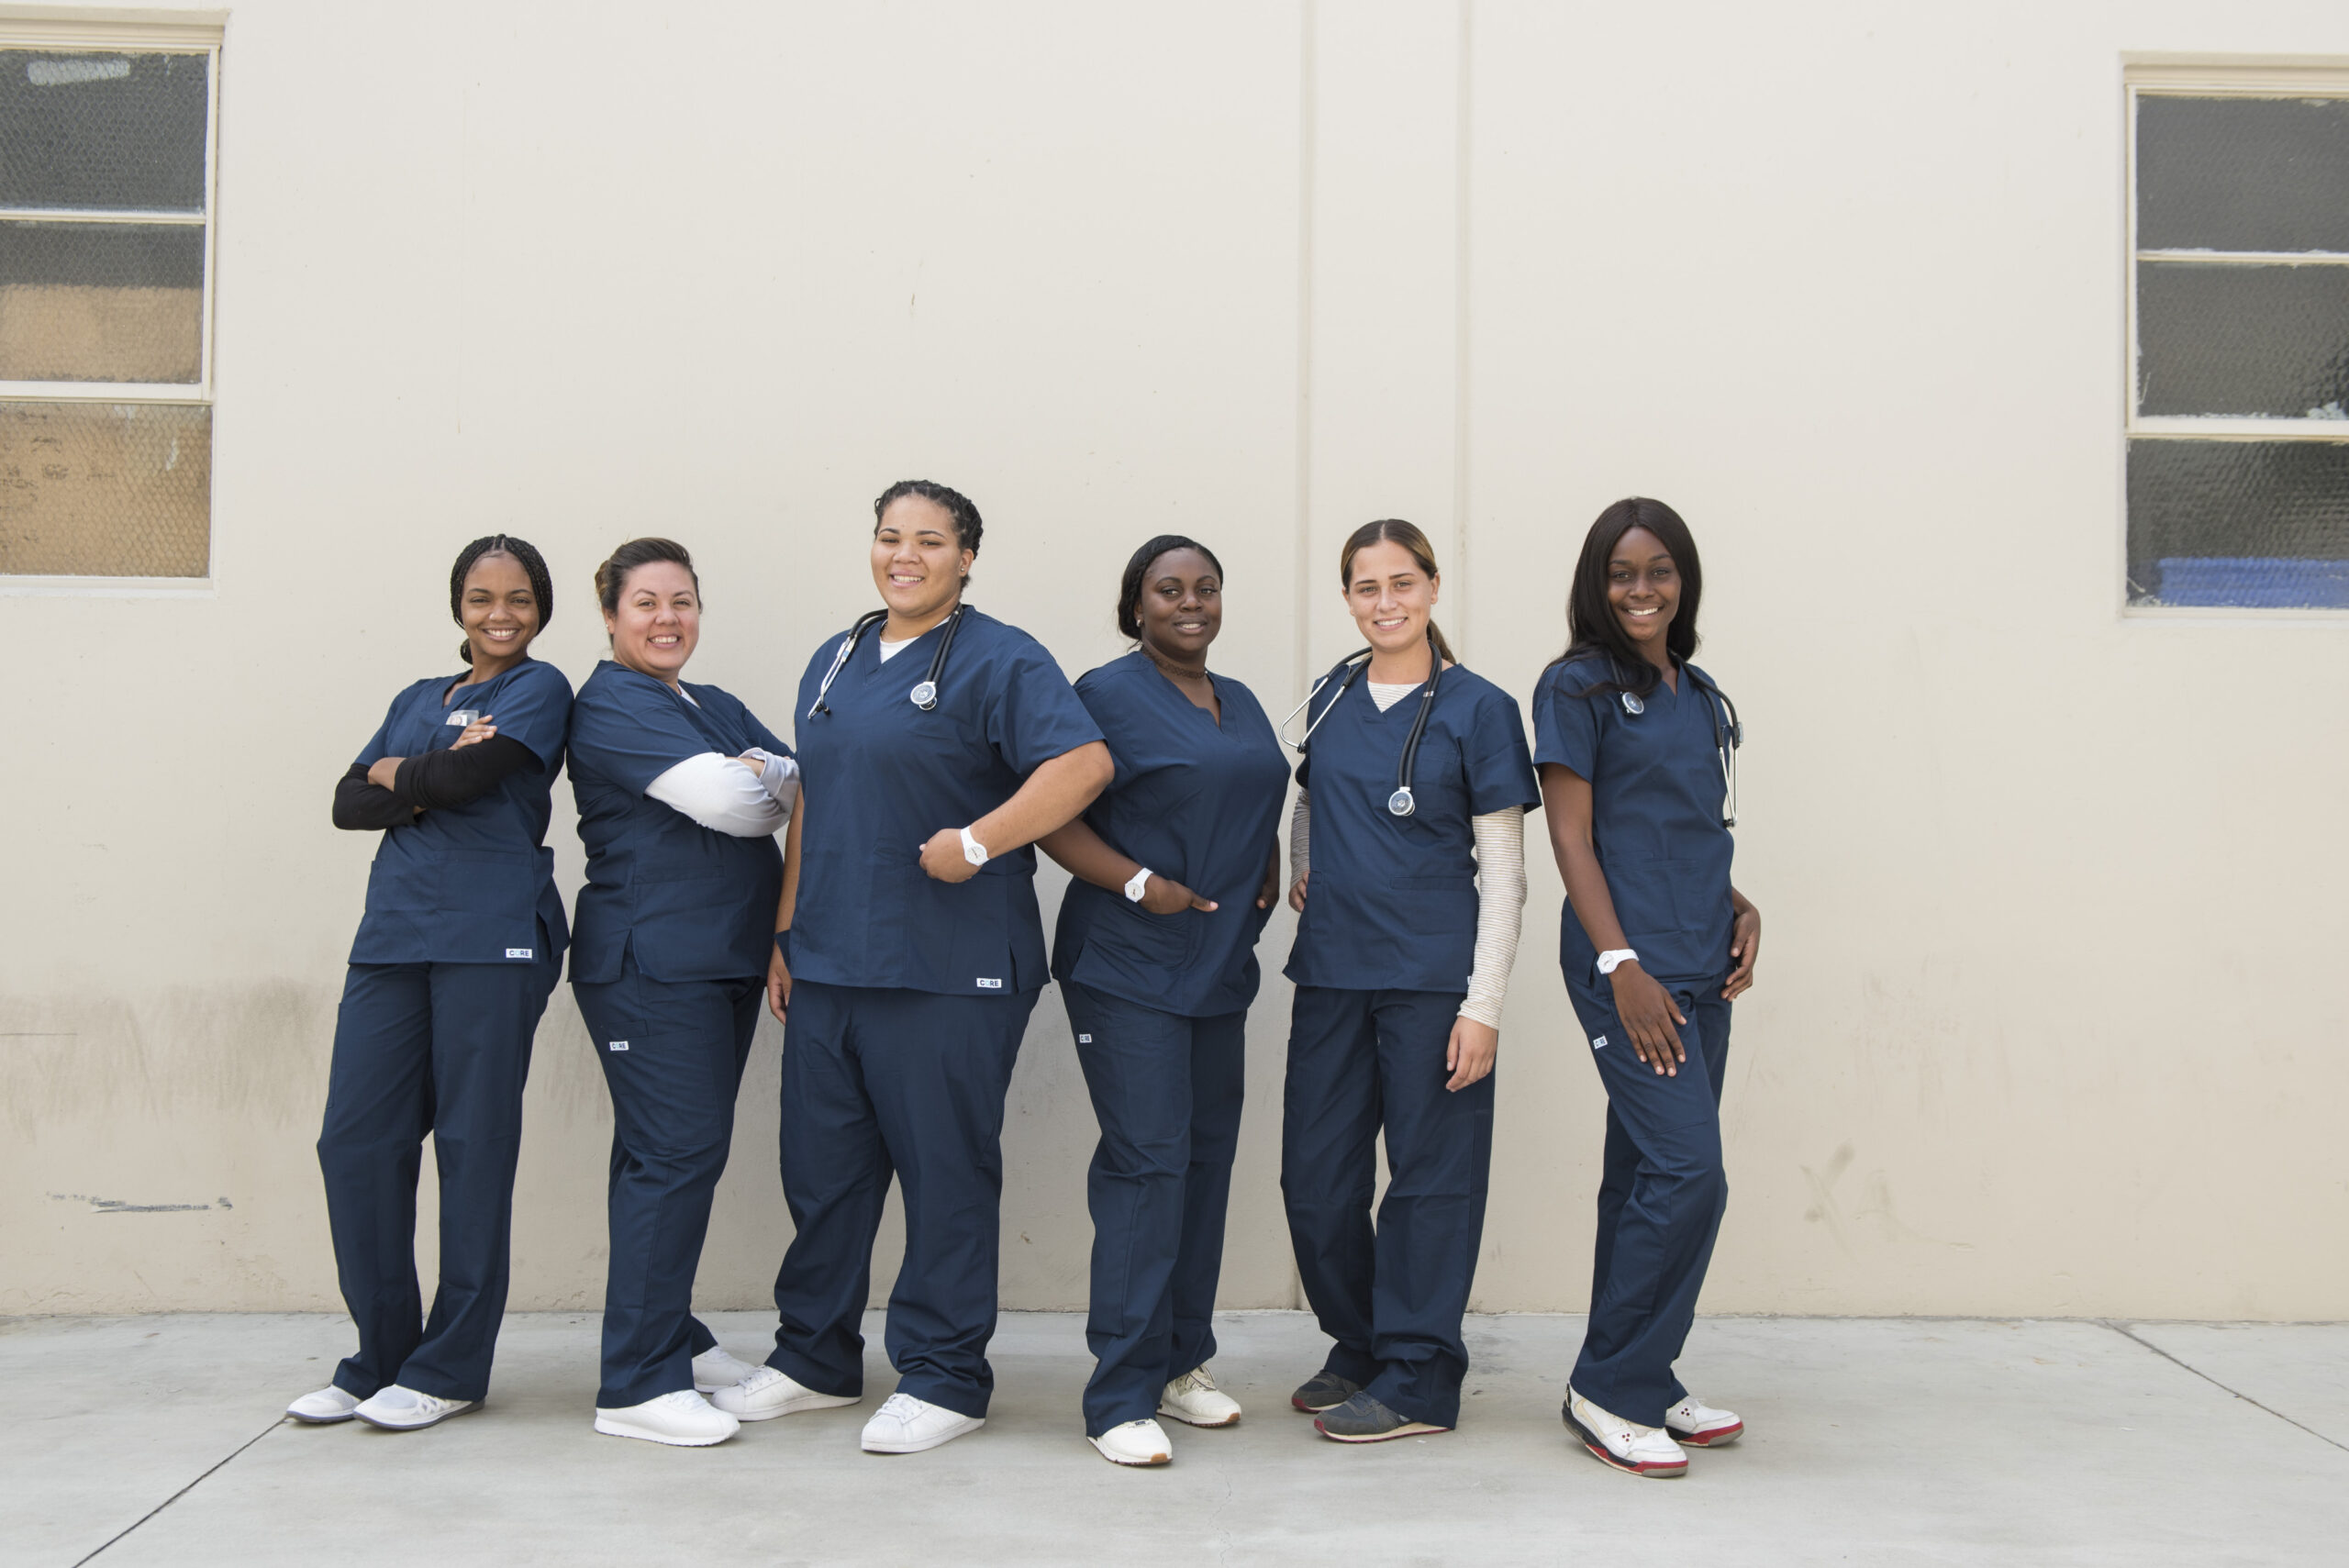 nurse aide students